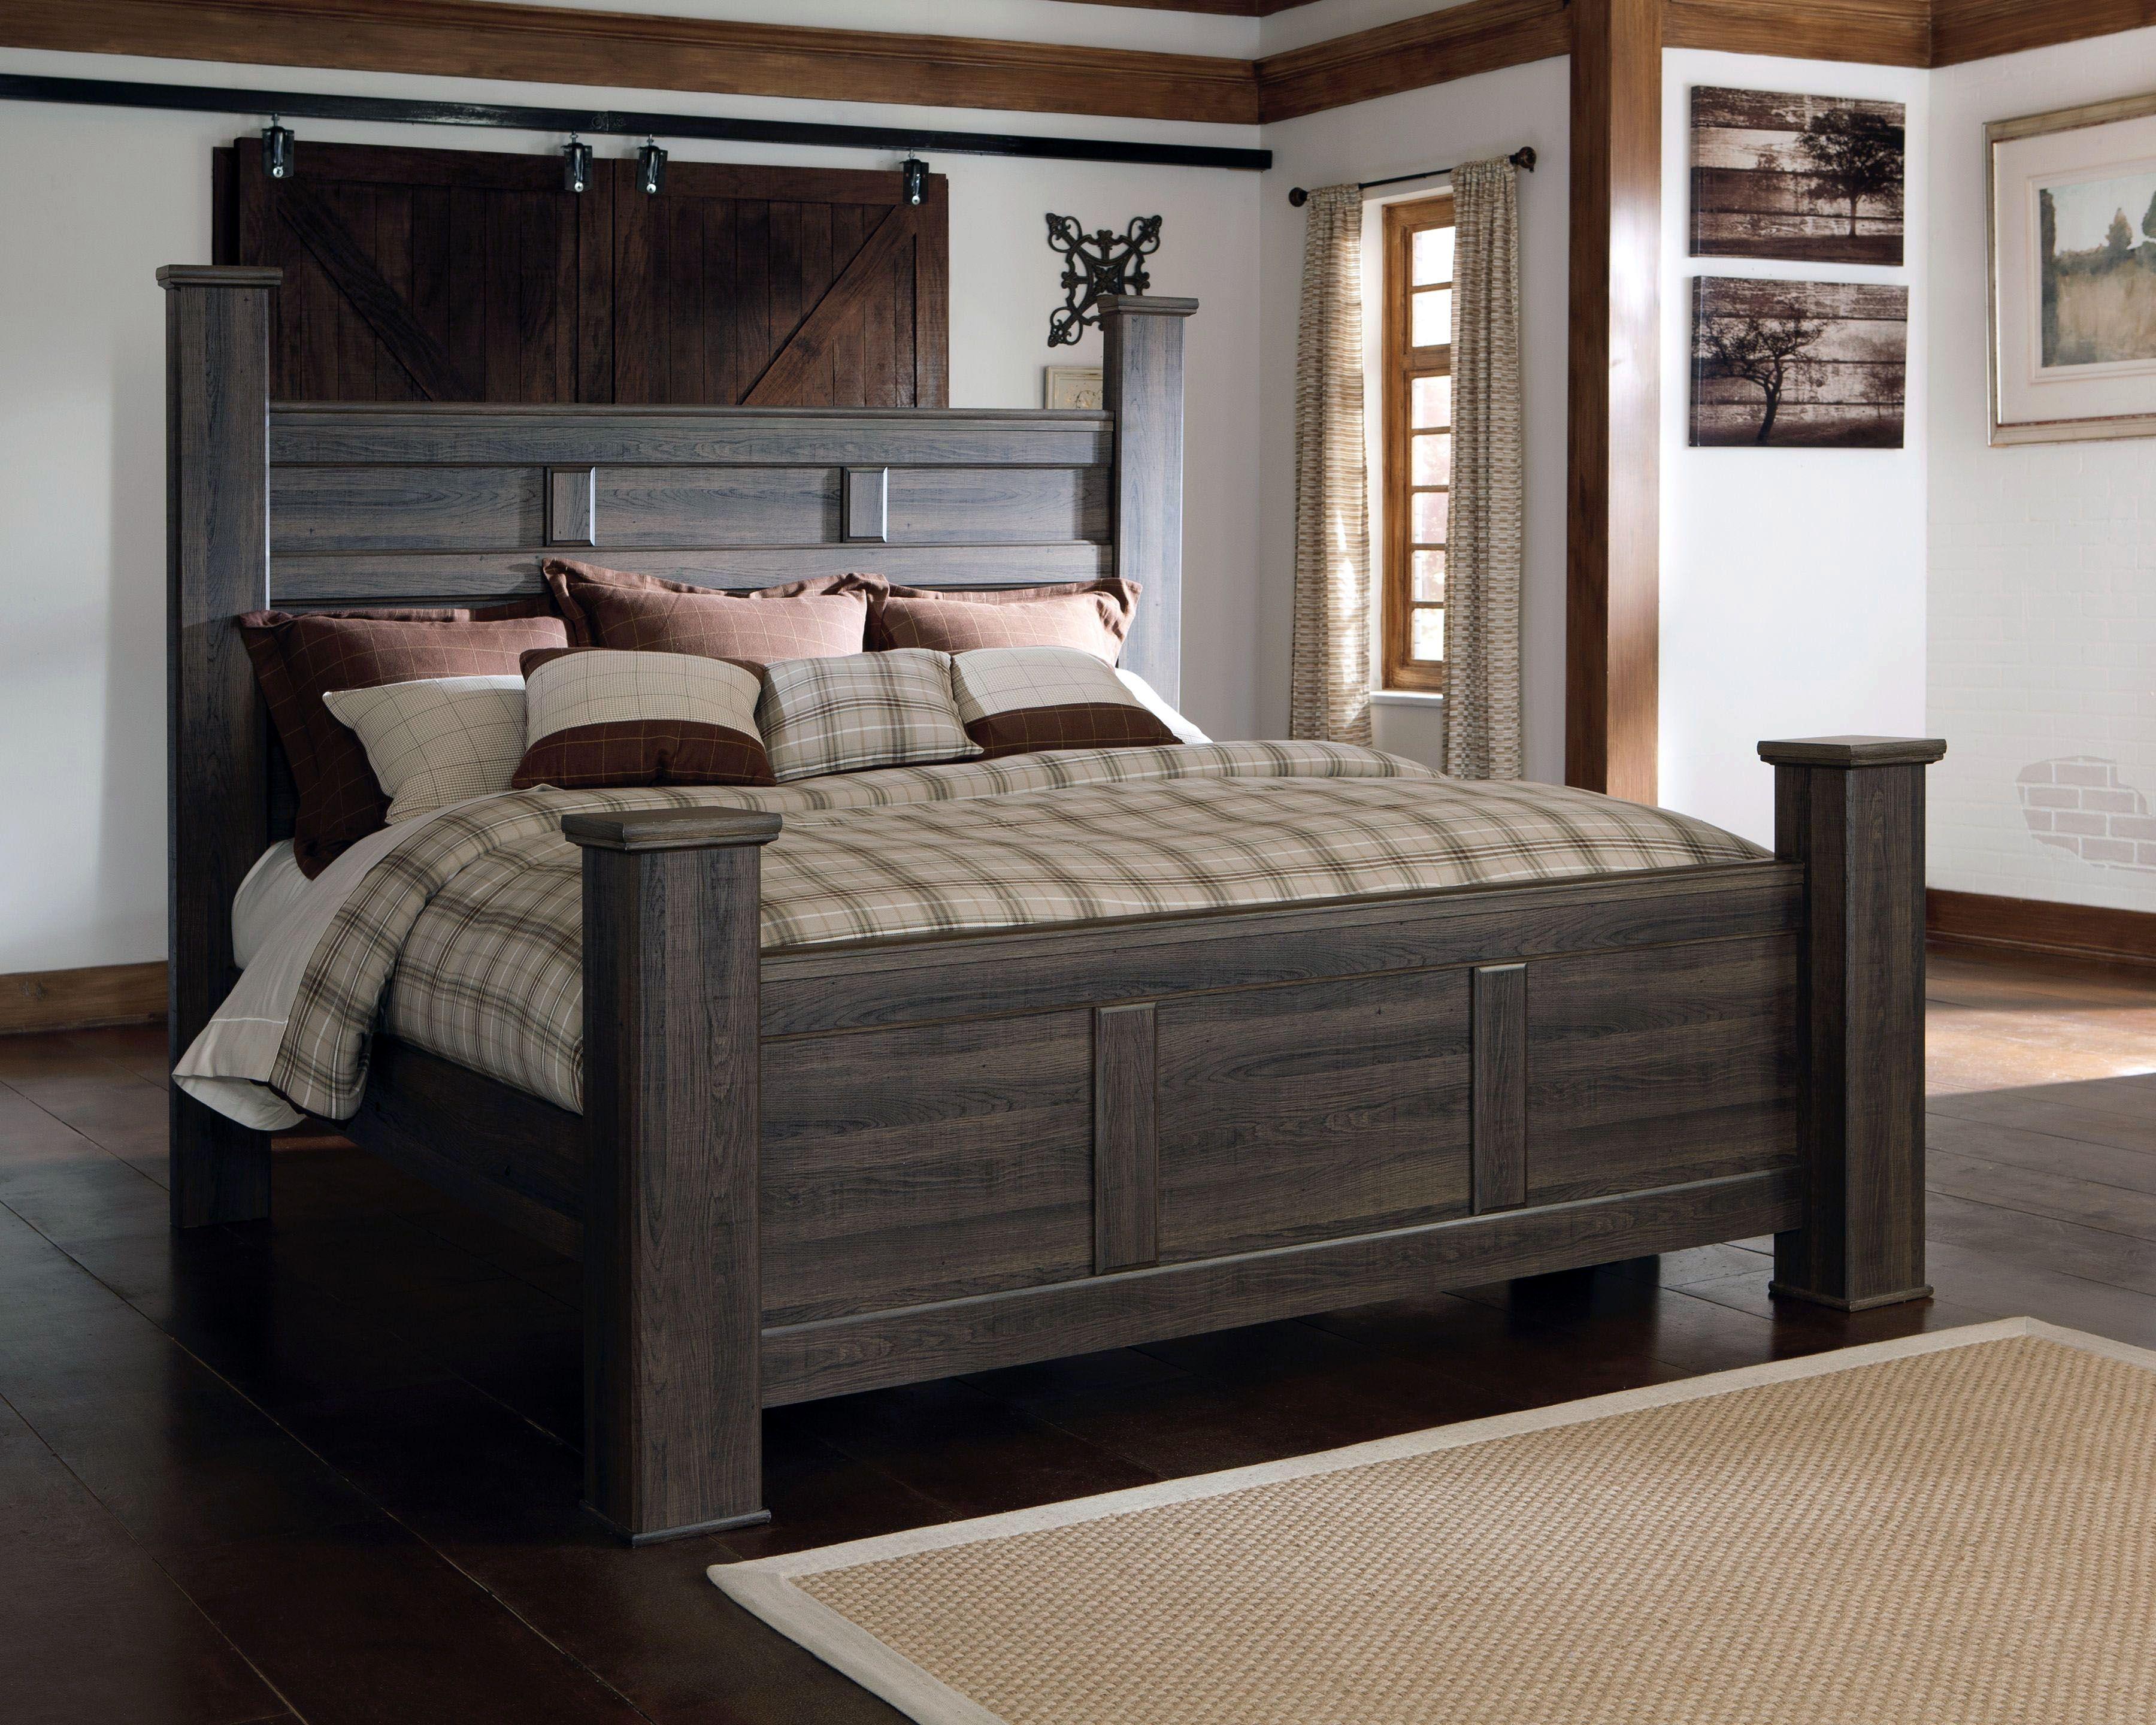 The Best And Easiest King Size Bed Jordans To Inspire You King Size Bedroom Sets King Sized Bedroom Bedroom Furniture Design